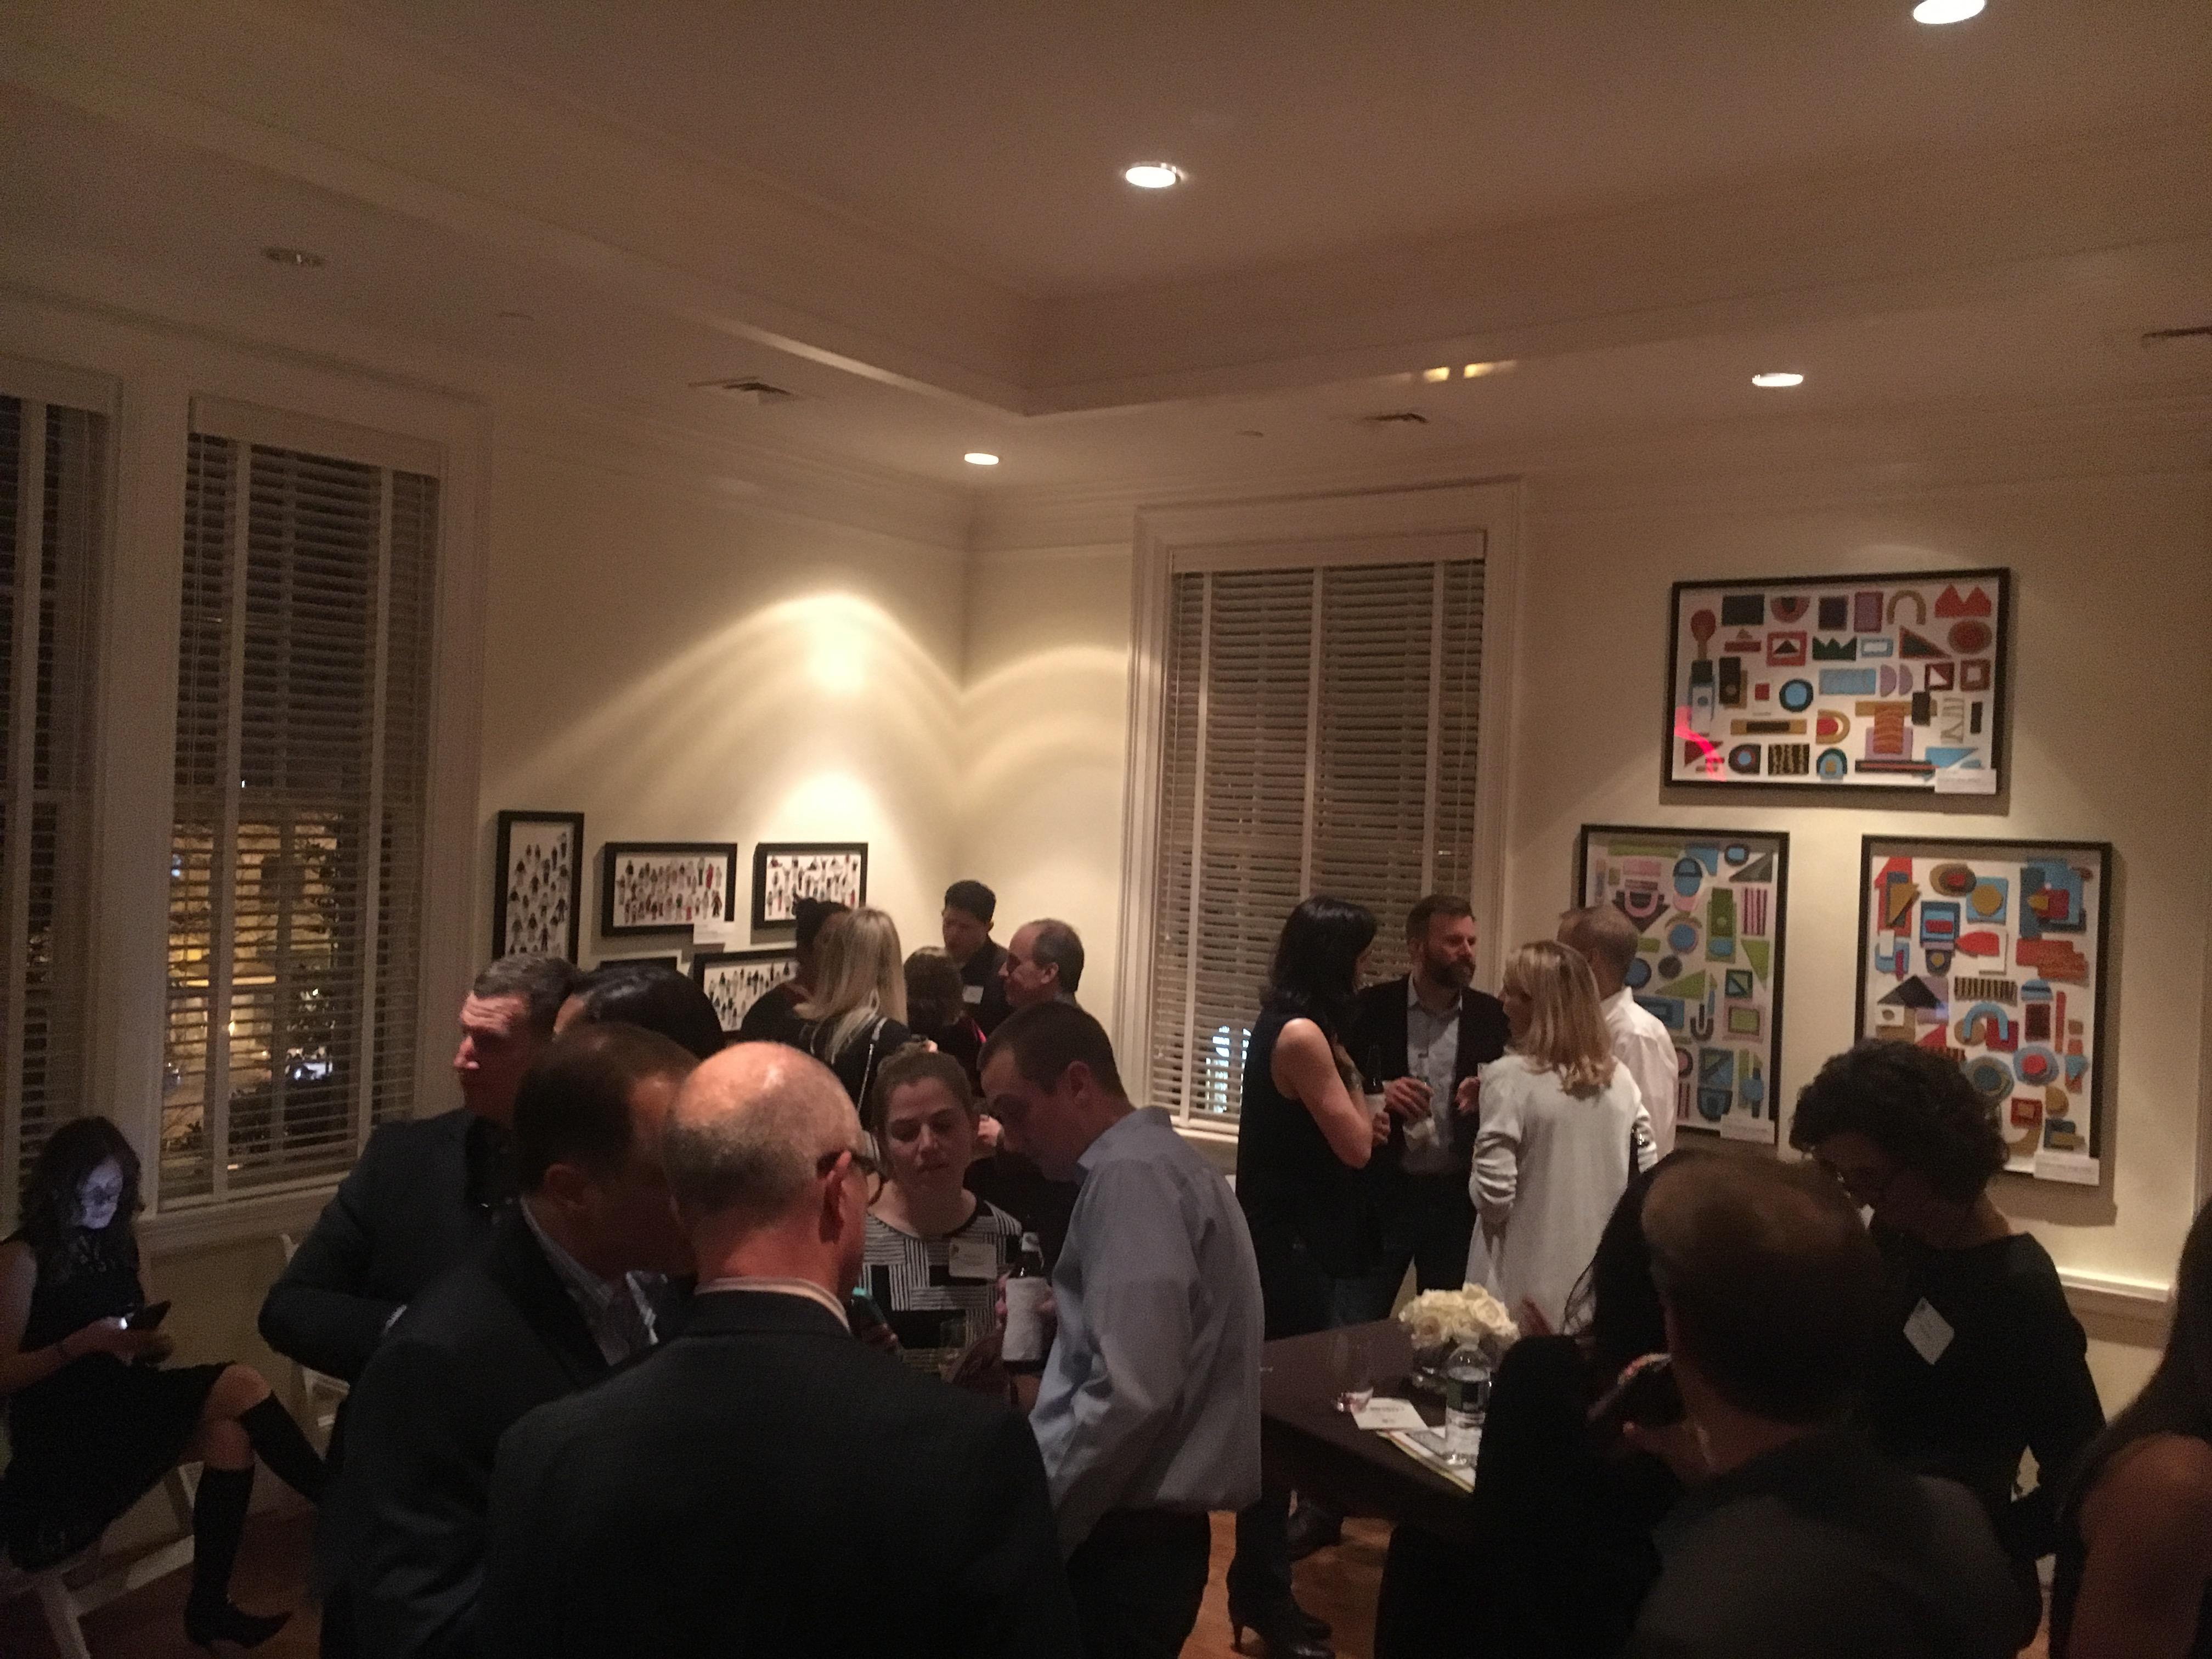 Hillary & Eric Kilfeather - 2017-02-11 19.44.56